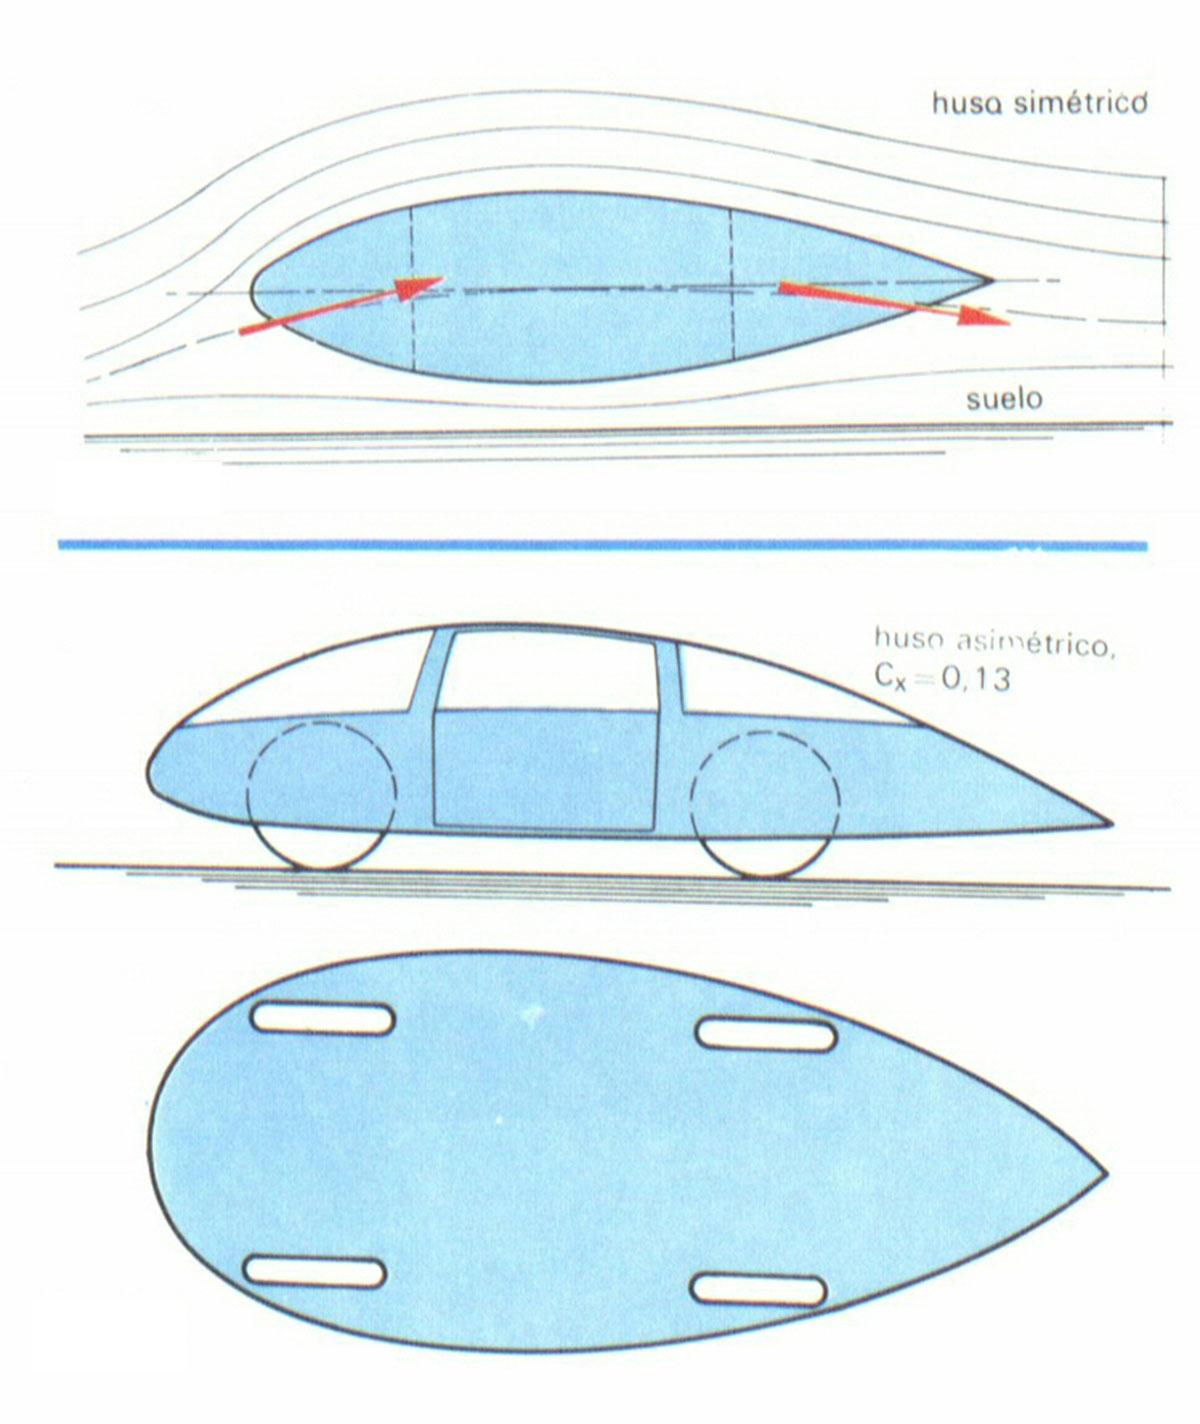 Foto Aerodinamica Forma Tecnica Explicaciones Fisica